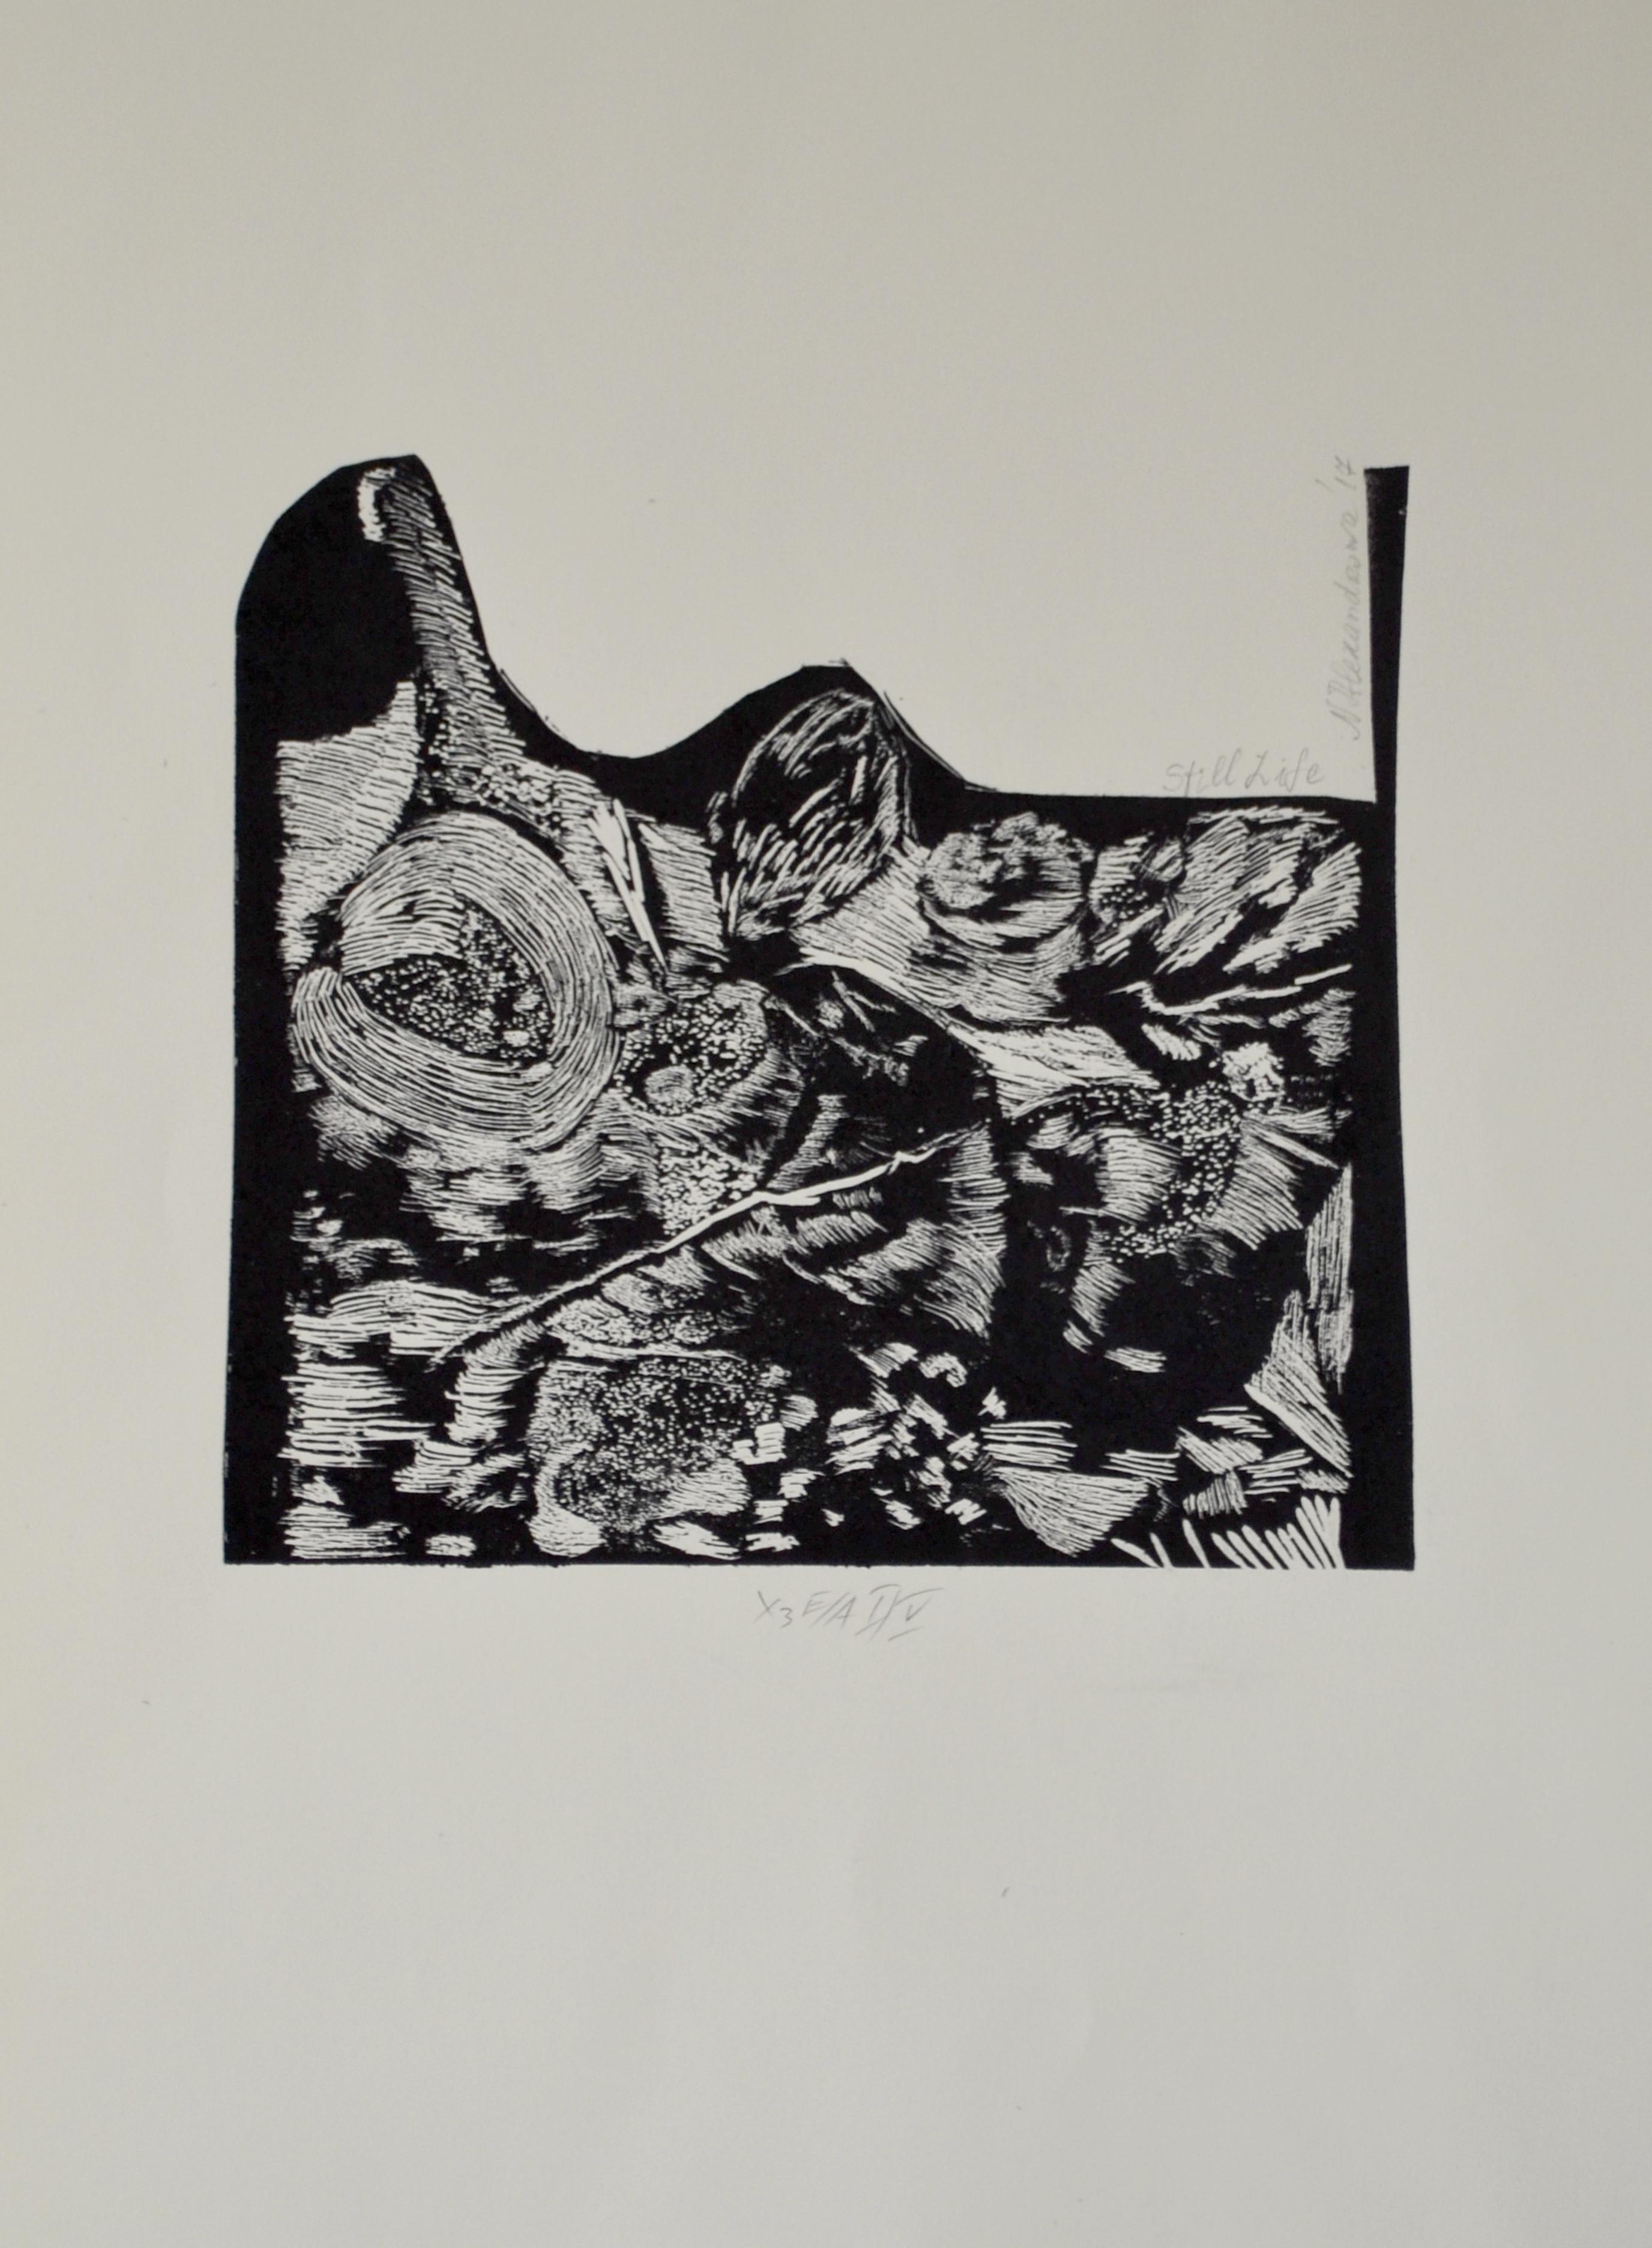 "Николинка Александрова, специалност ""Изобразително изкуство"", Натюрморт I, 2018 / Nikolinka Aleksandrova, degree programme ""Fine Arts"", Still Life I, 2018"